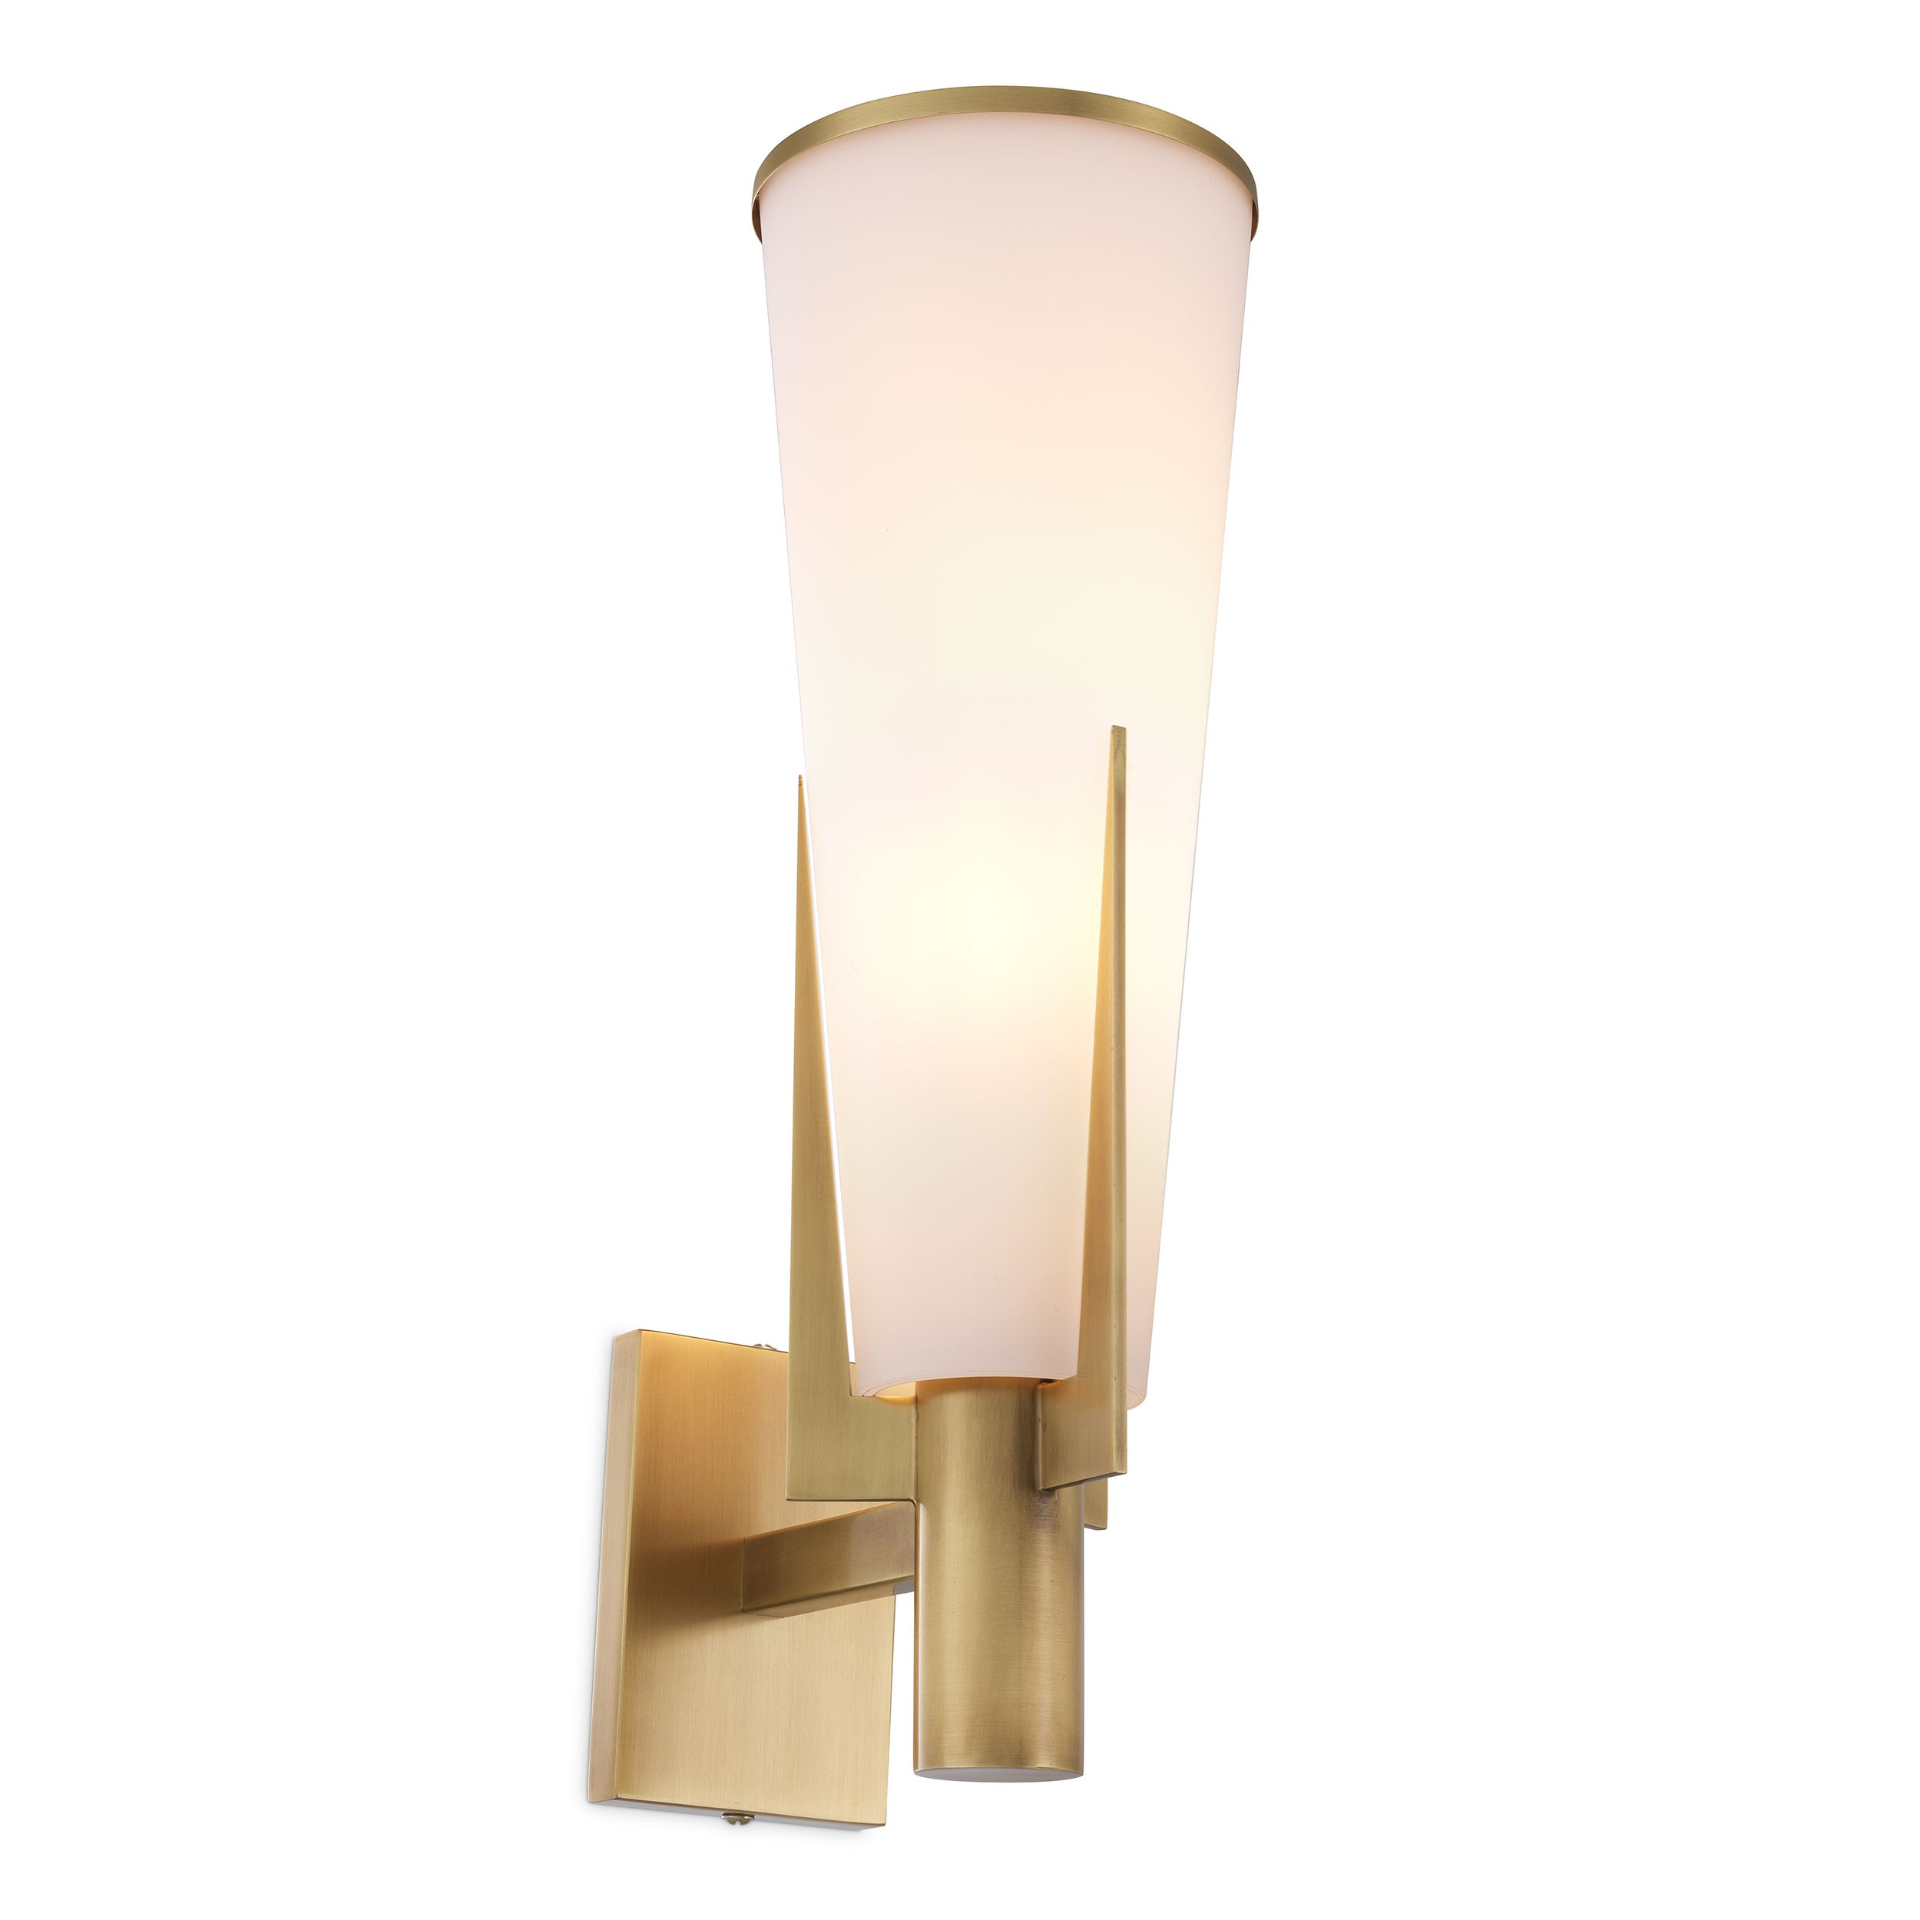 WALL-LAMP-DINO-EICHHOLTZ